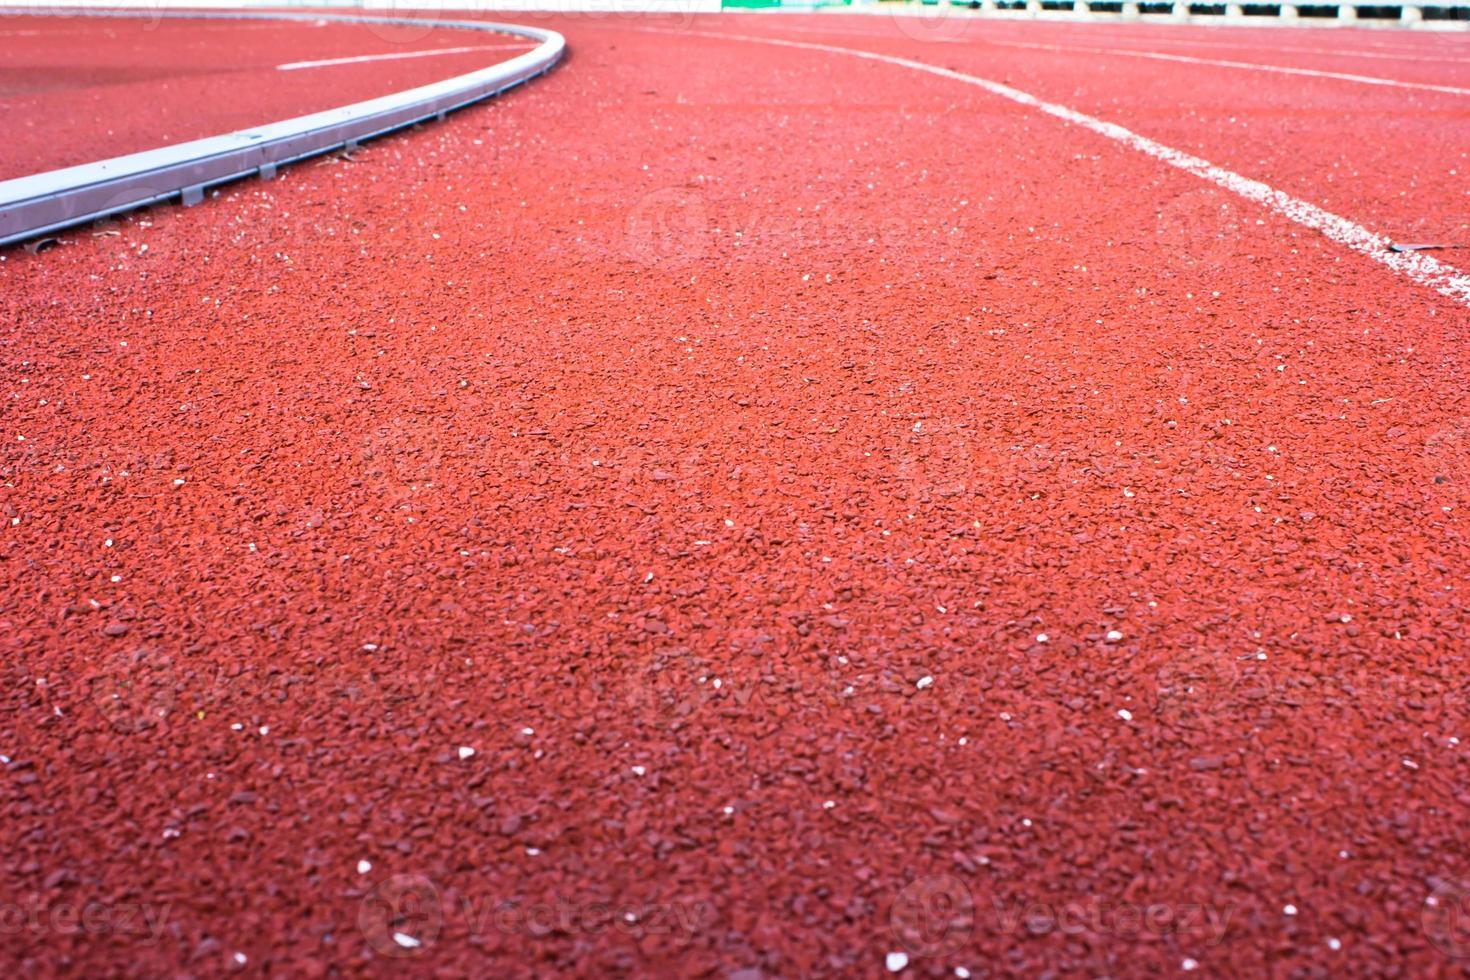 löparbana gummistandard röd färg foto